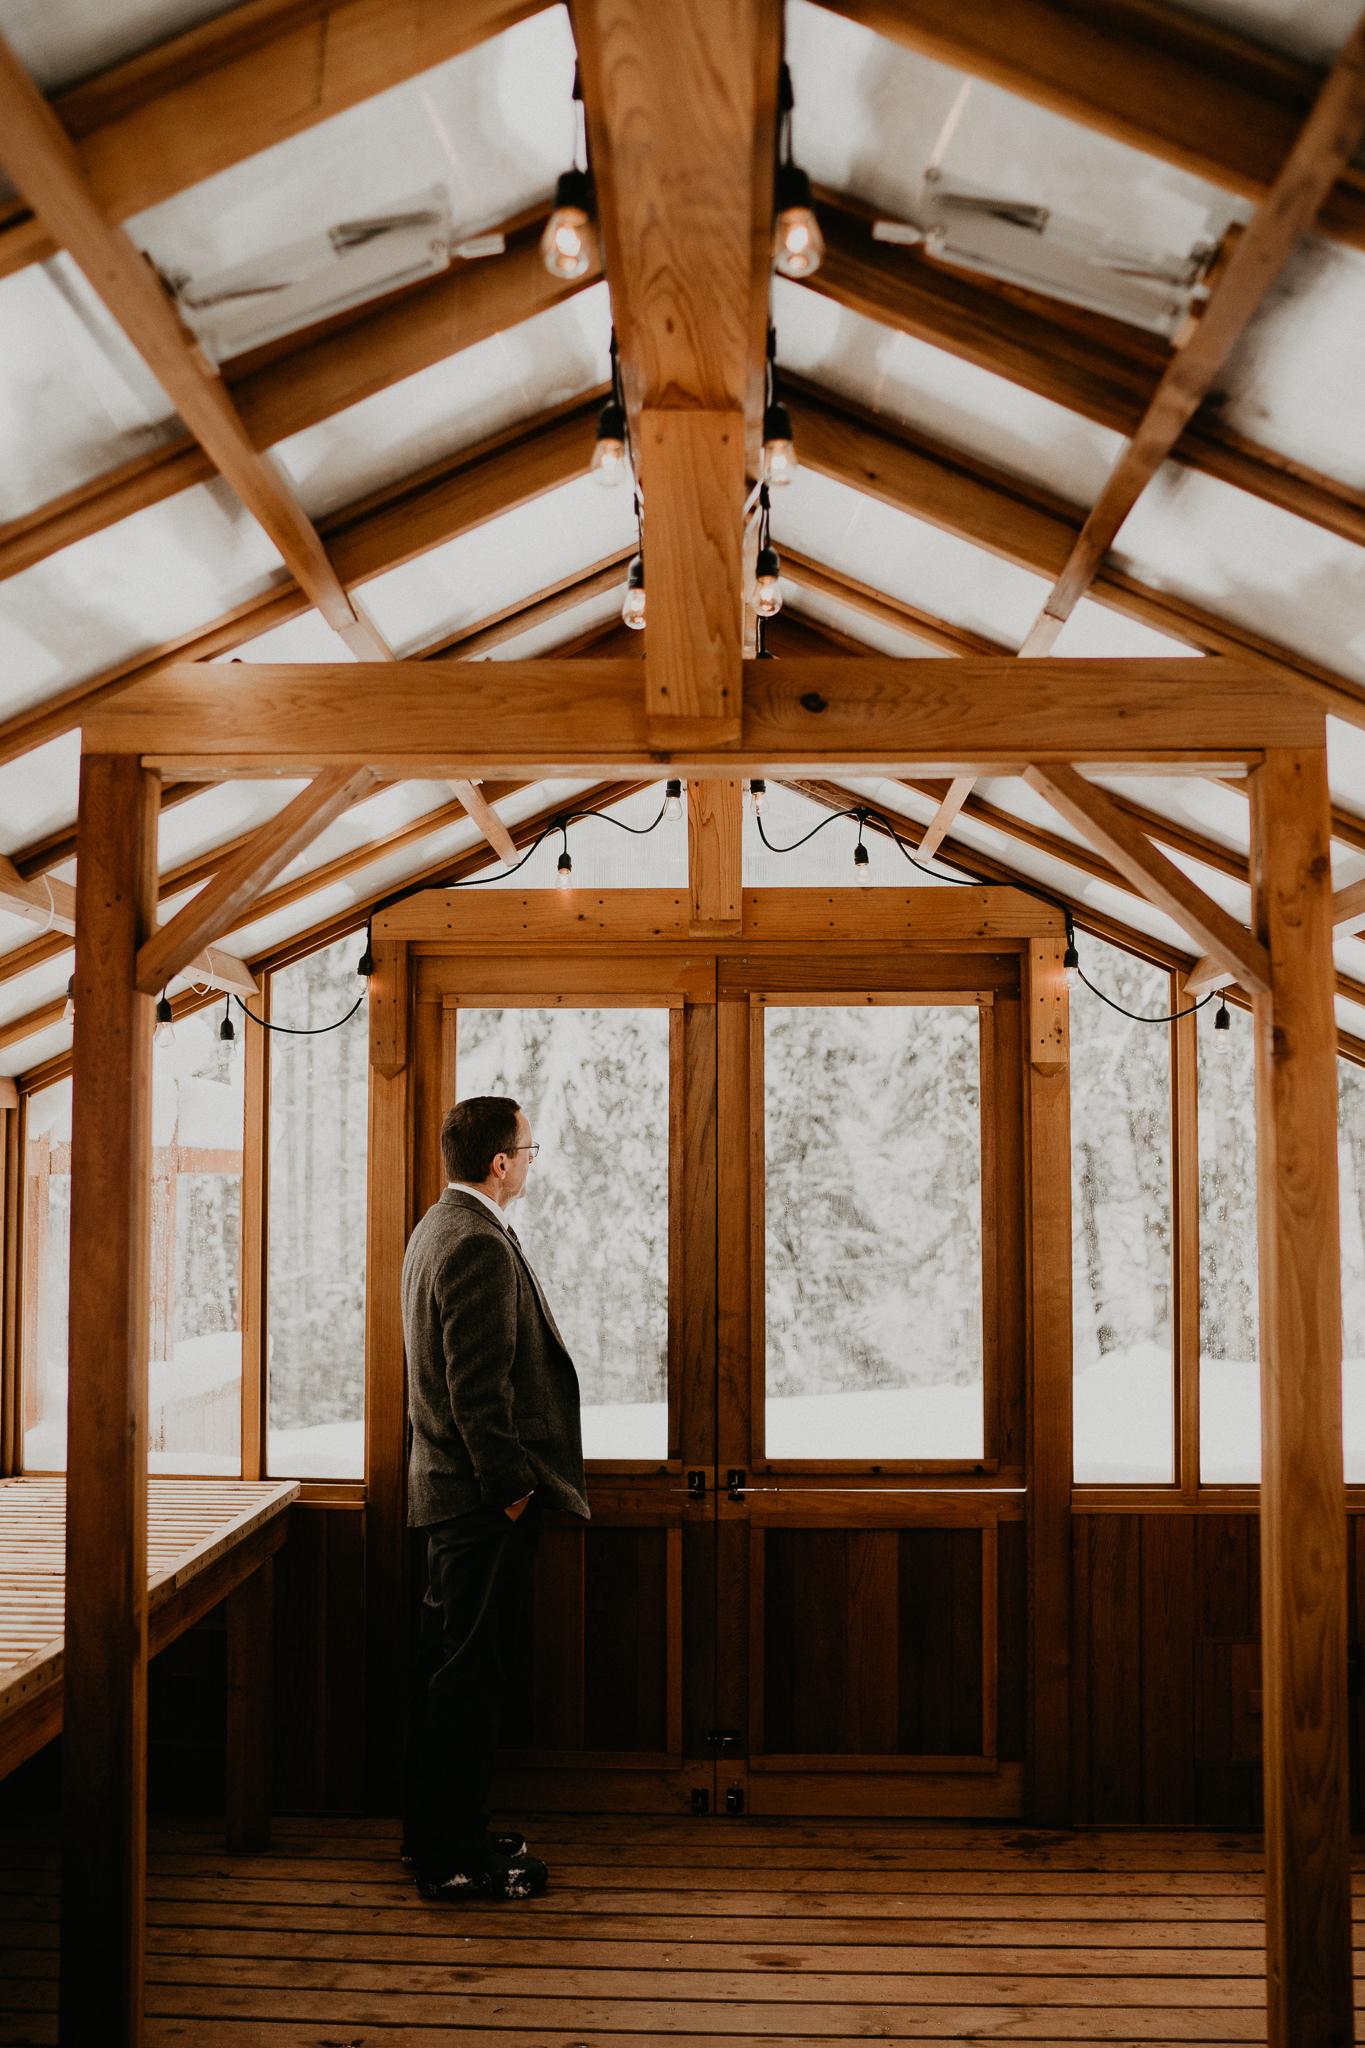 Mount-Rainier-Snow-Winter-Elopement-Adventure-Photographer2-13.jpg